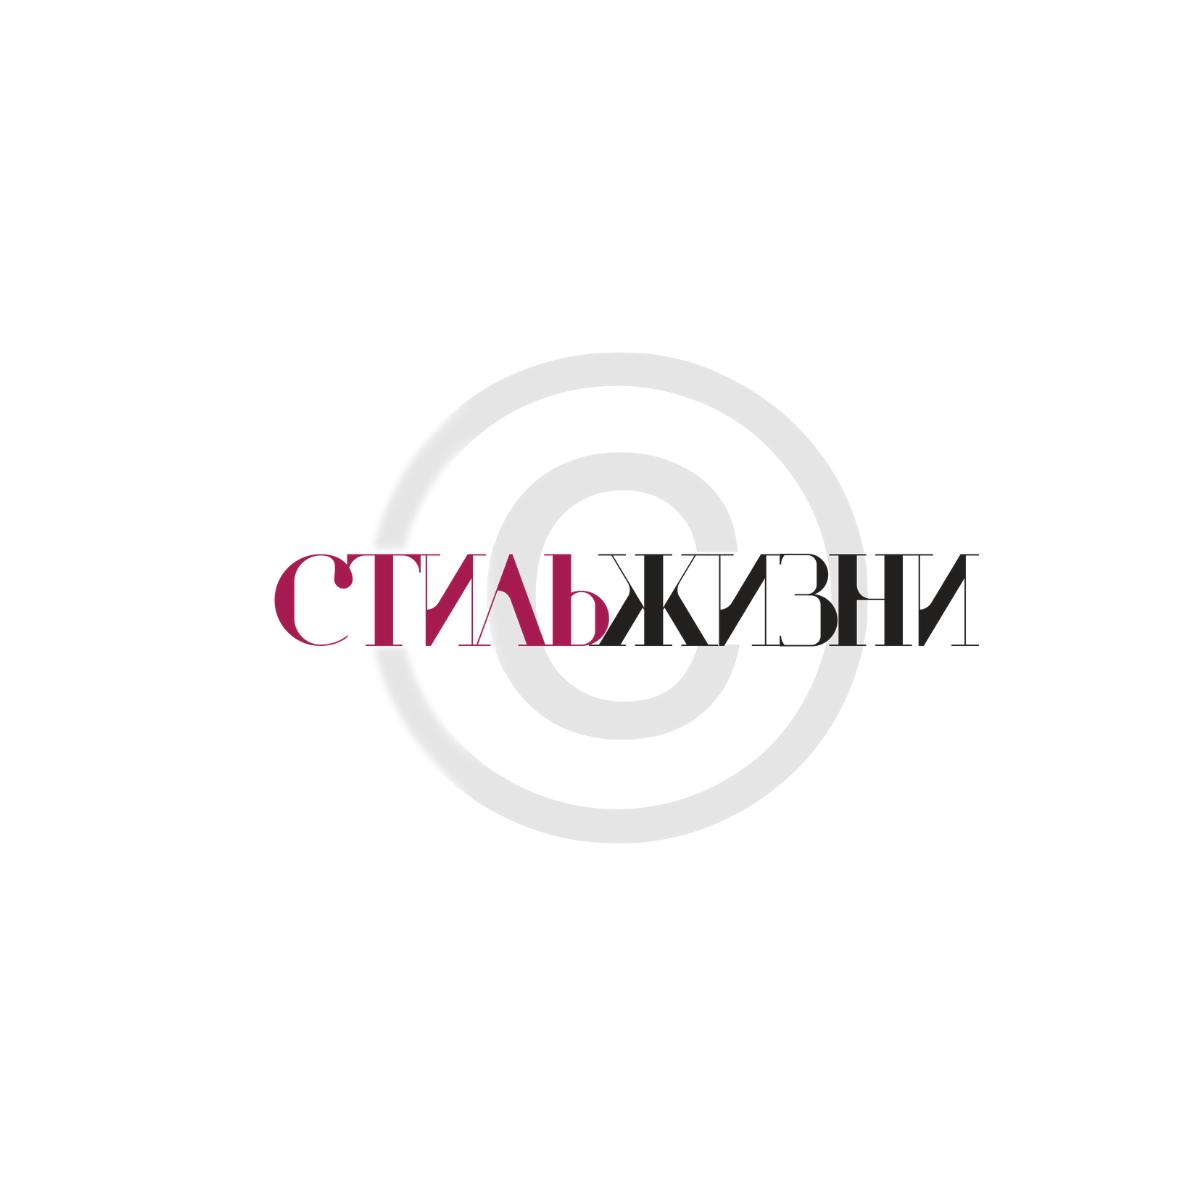 Olga Balakleets, Founder & CEO (36)